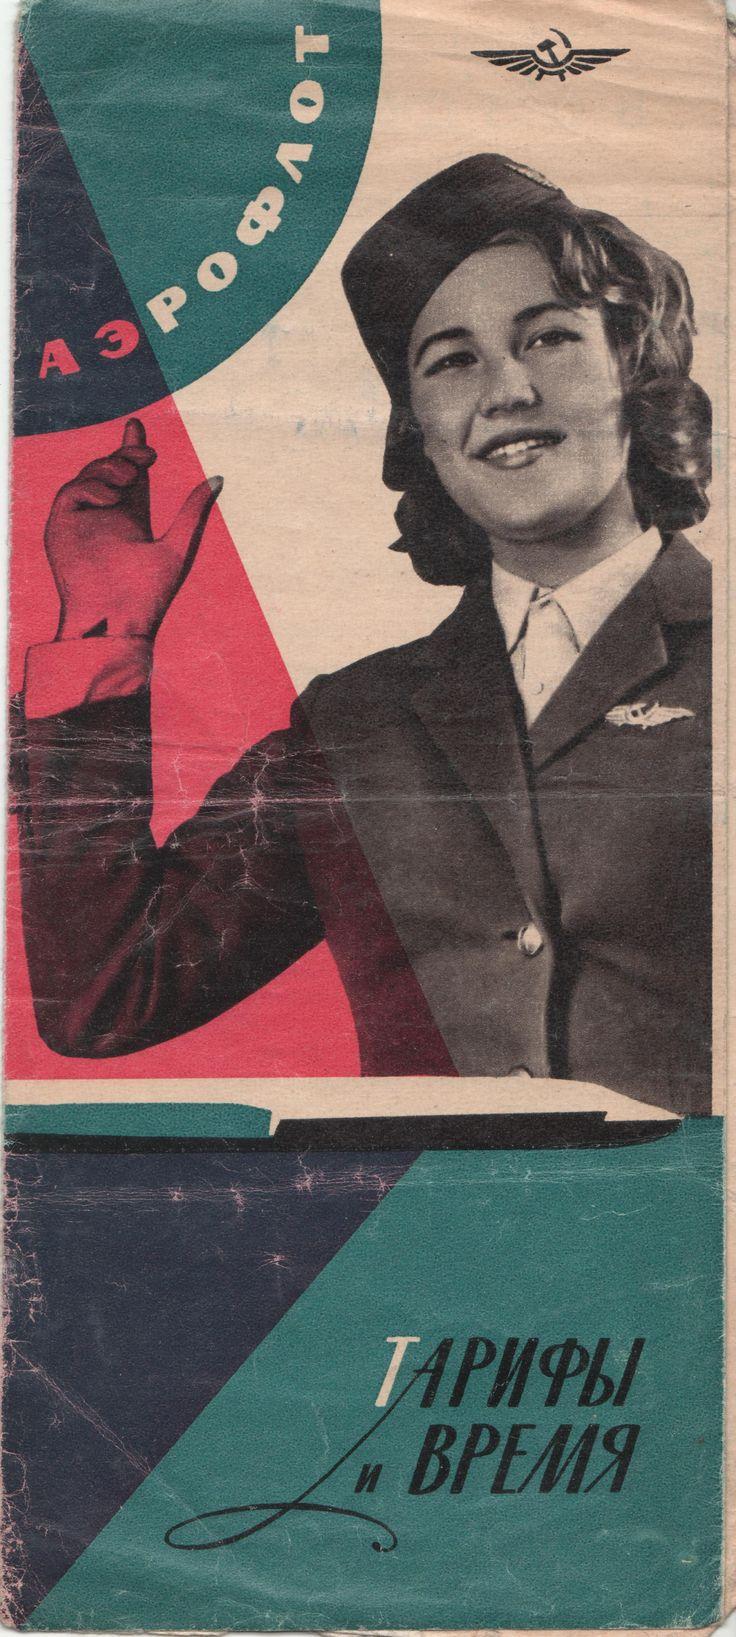 Aeroflot ~ Soviet Airlines vintage travel poster